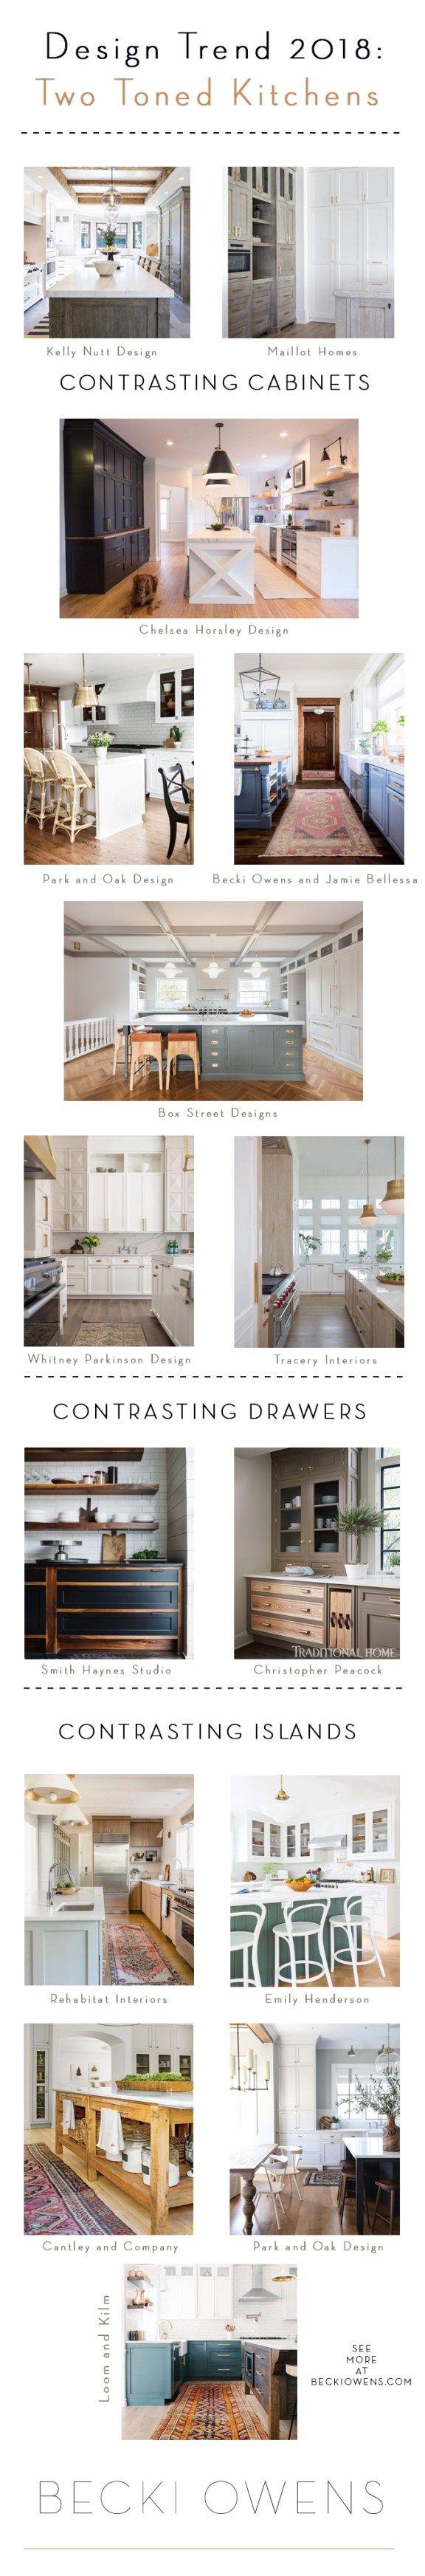 BECKI OWENS- Design Trend 2018: Two Tones Kitchens